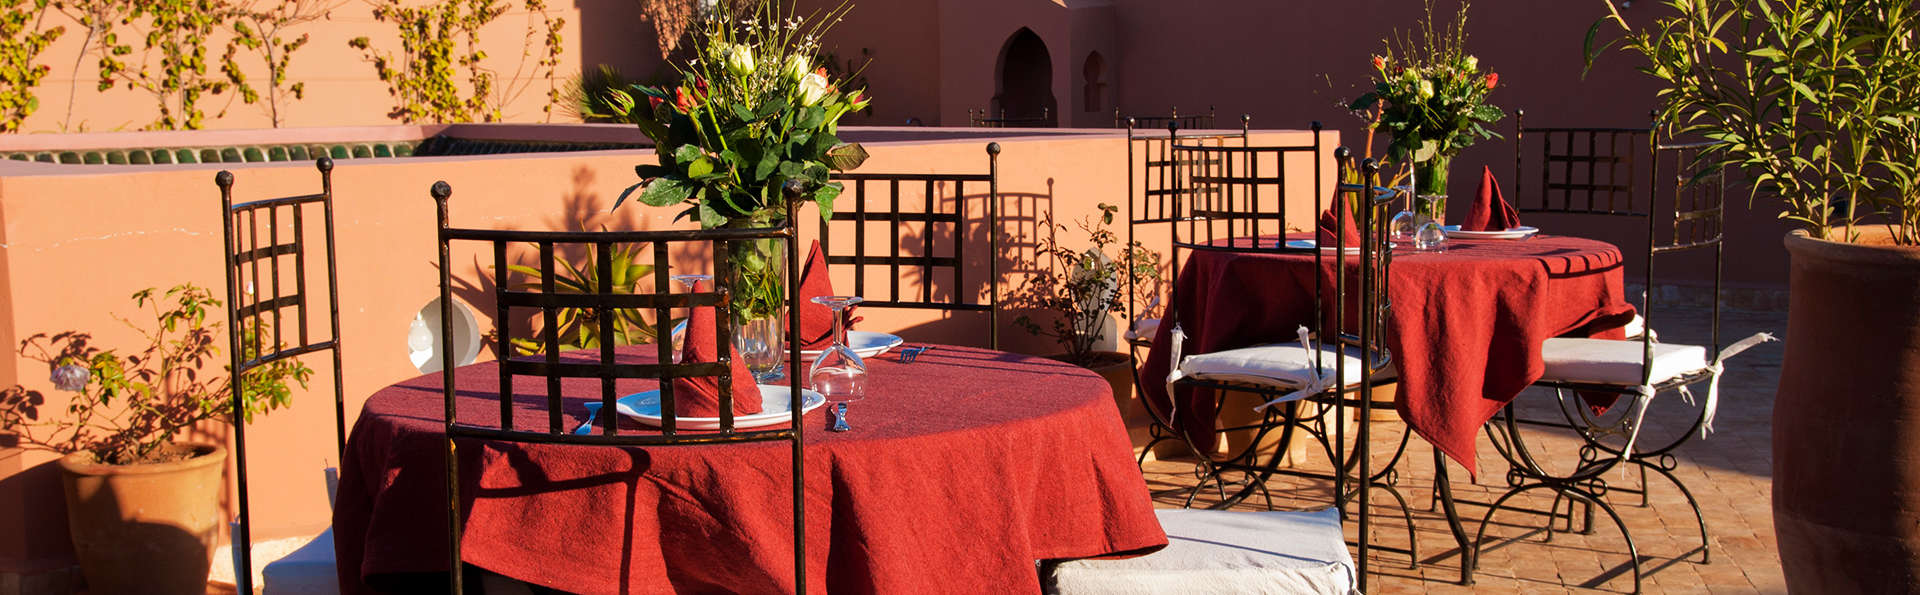 Estancia con cena típica marroquí en Marrakech (desde 3 noches)